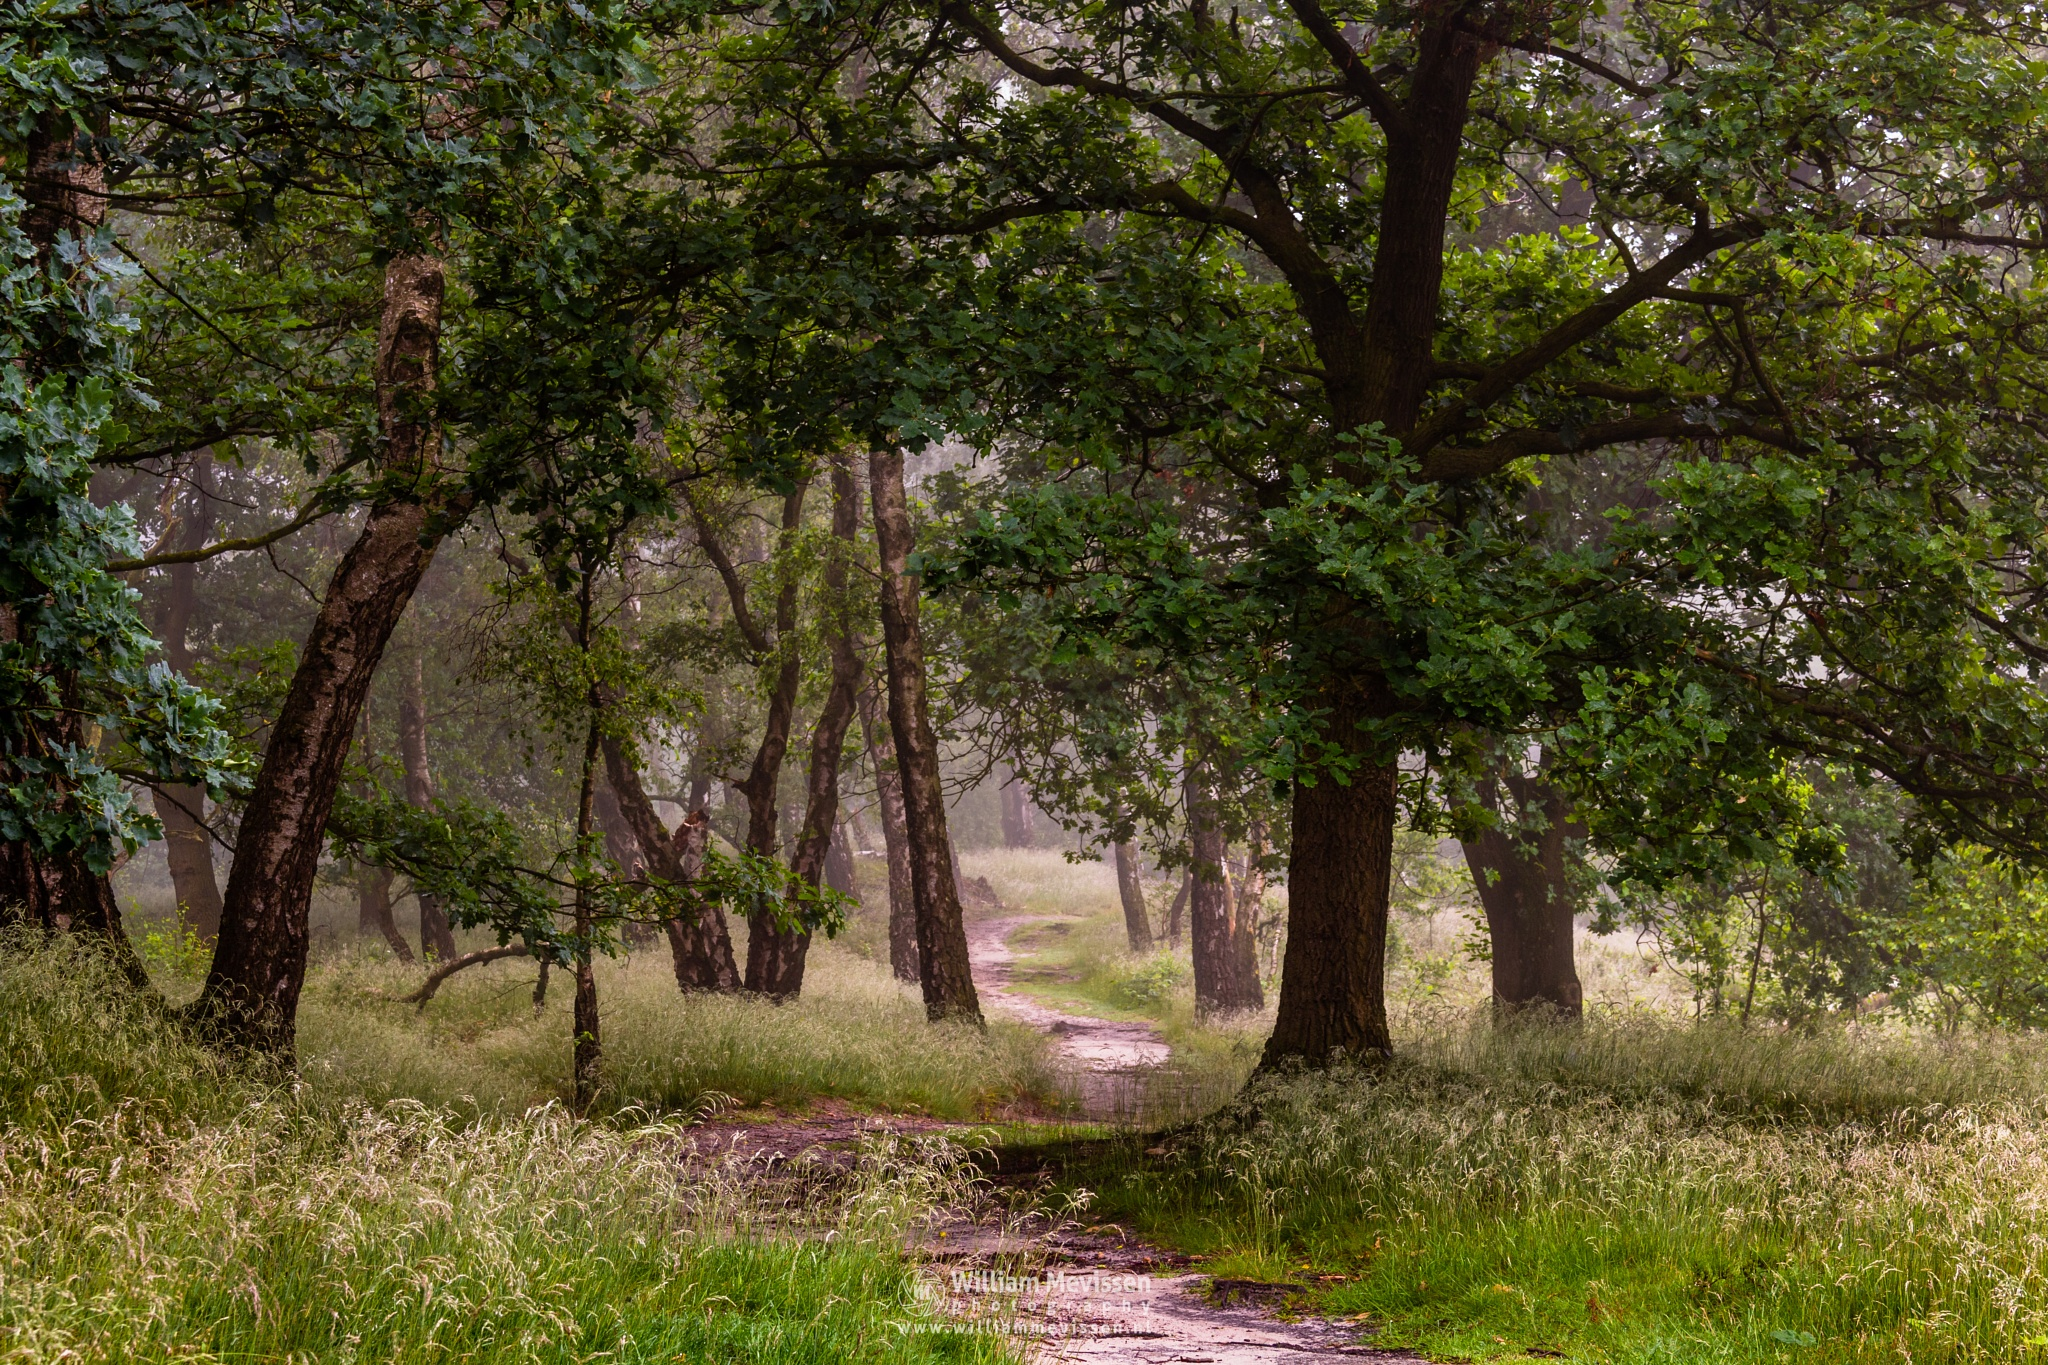 Misty Path Of Trees by William Mevissen